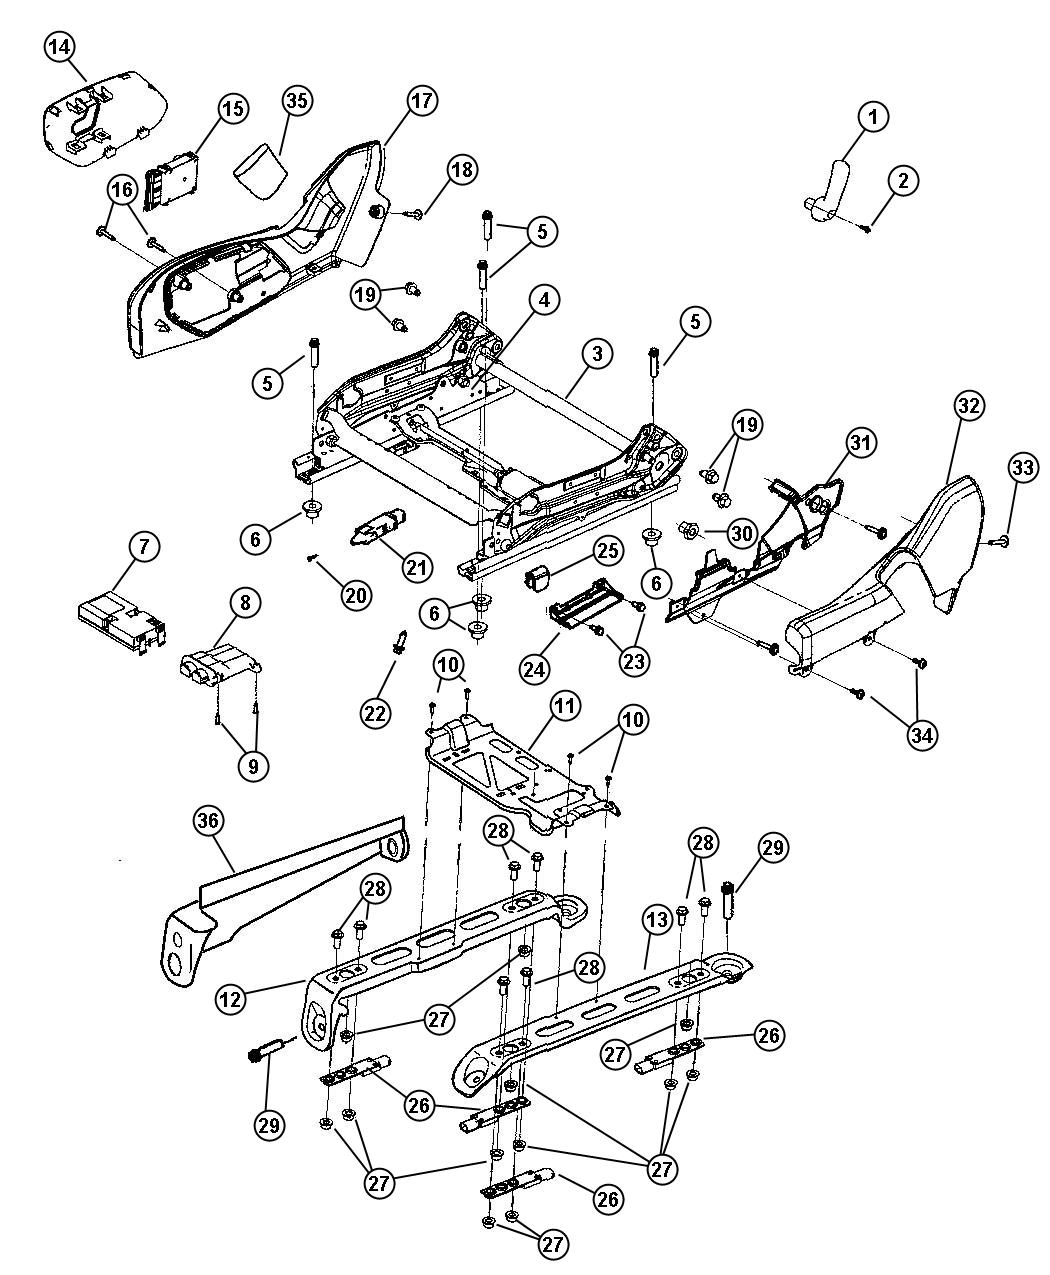 Jeep Grand Cherokee Sensor Kit Strain Gauge Trim Yl Seats Way Heated